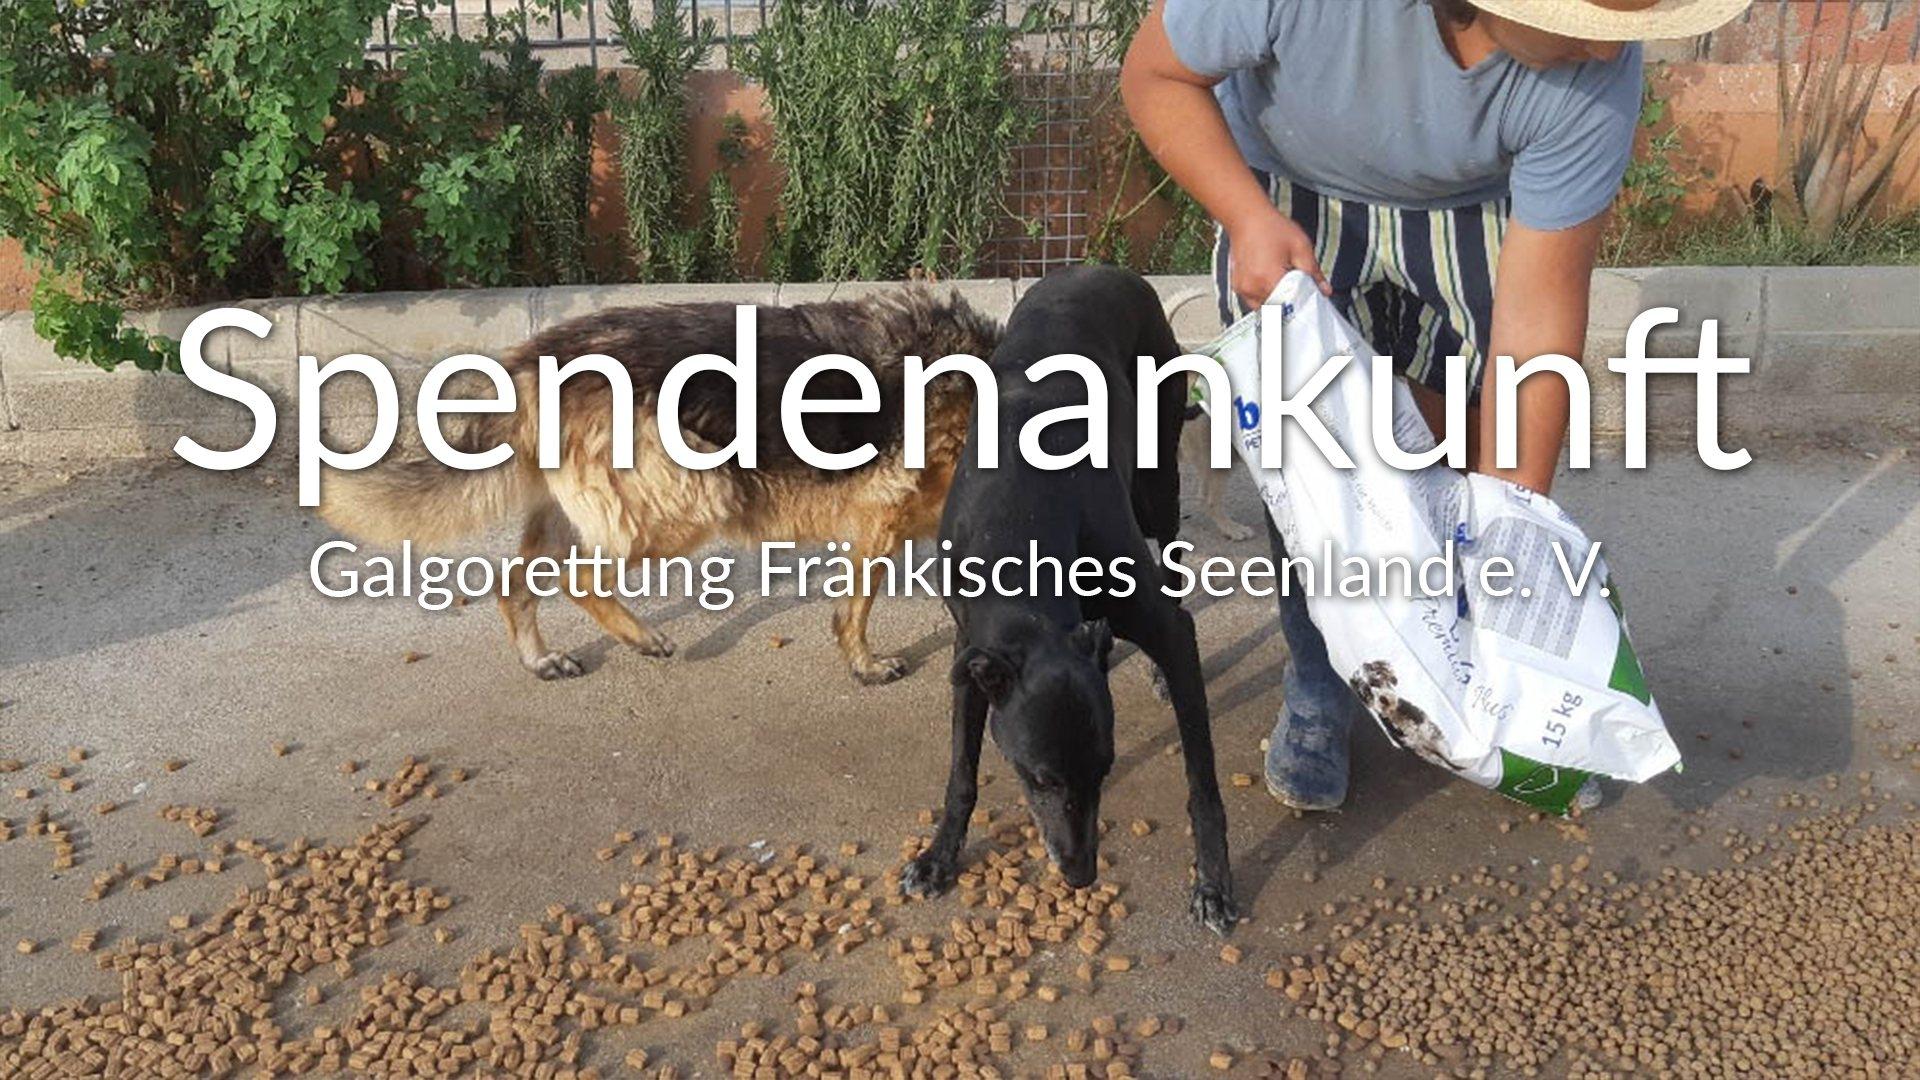 Galgorettung Fränkisches Seenland_Galgo Aktion_Spanien_Thumbnail